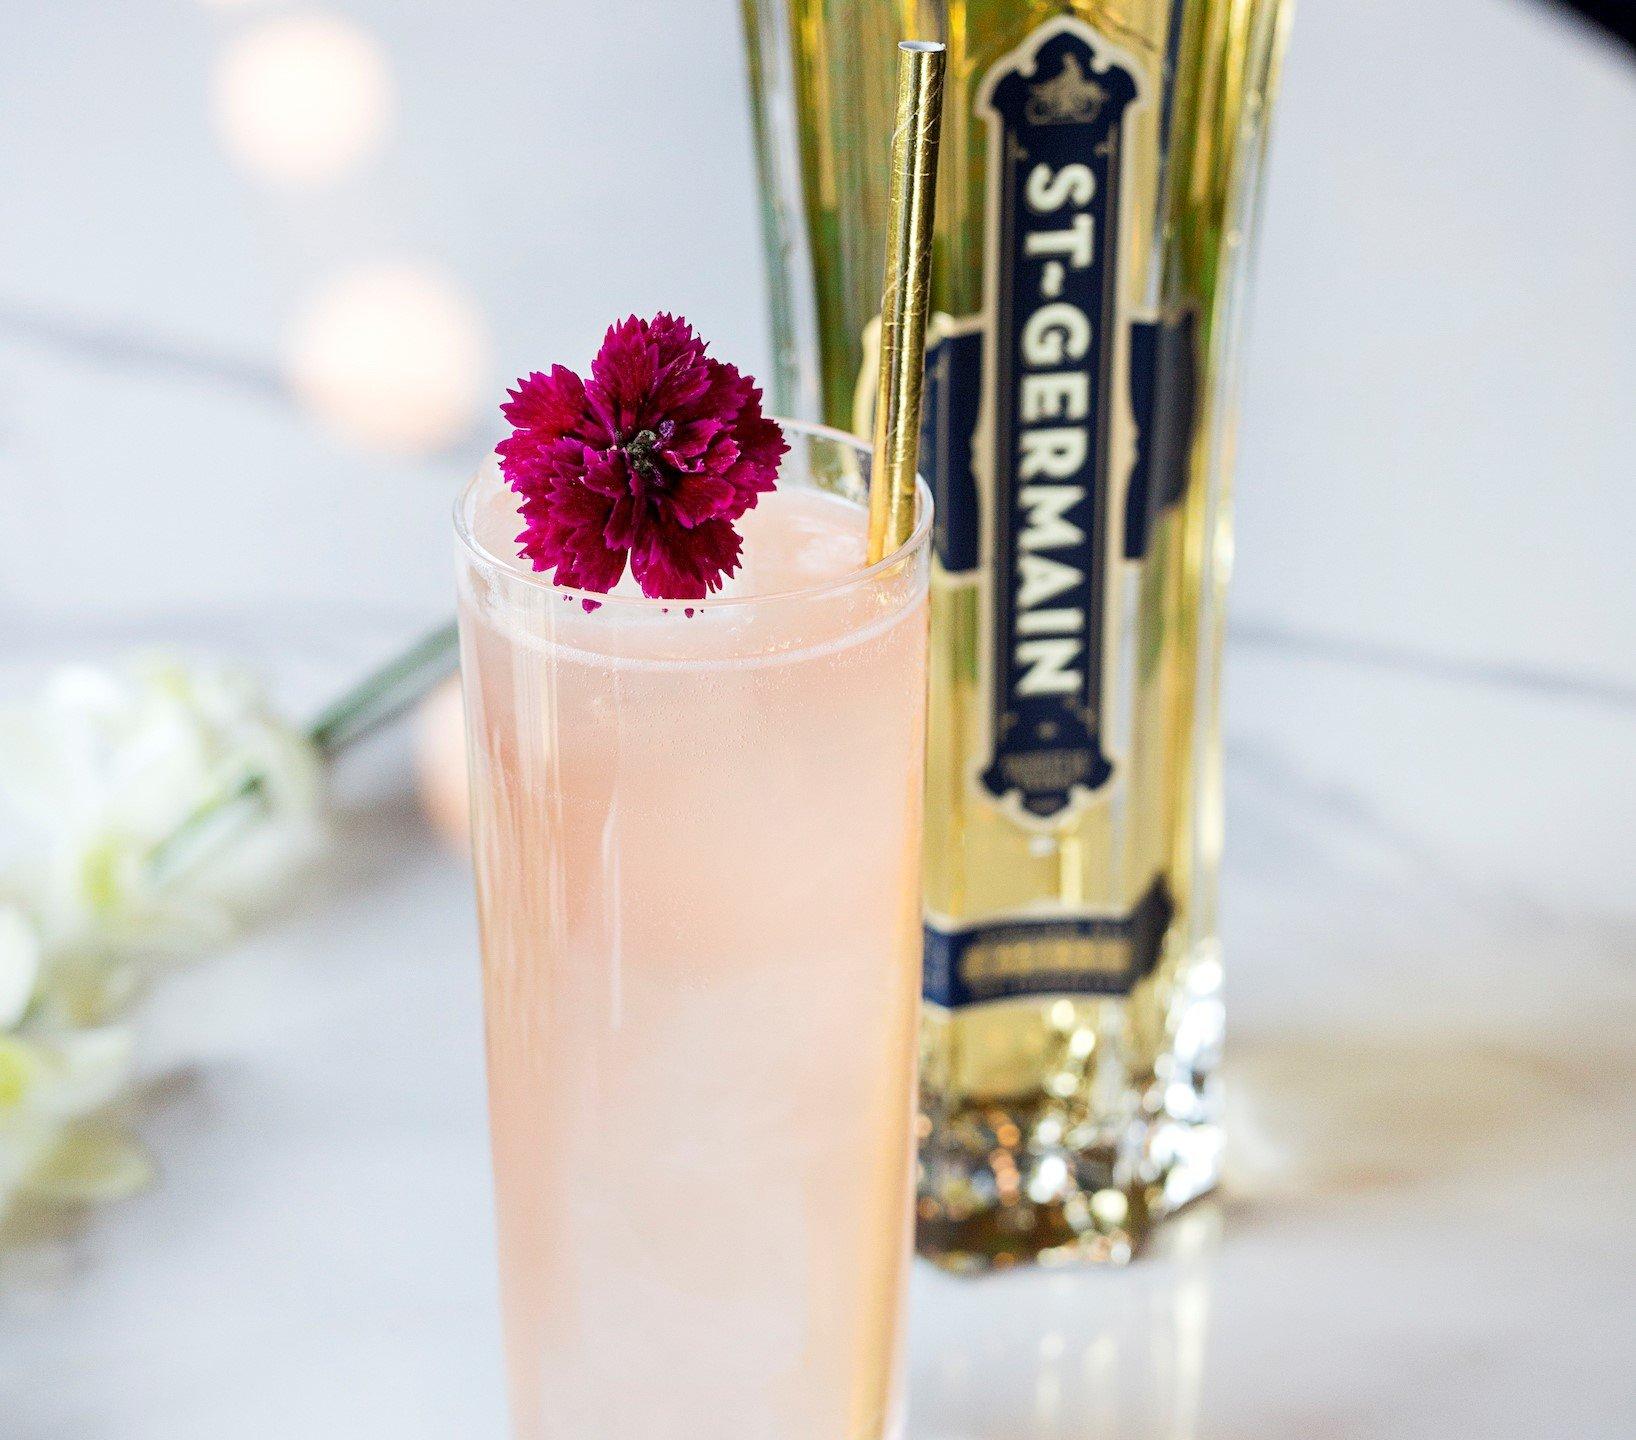 Royal Spritz Cocktail St Germain